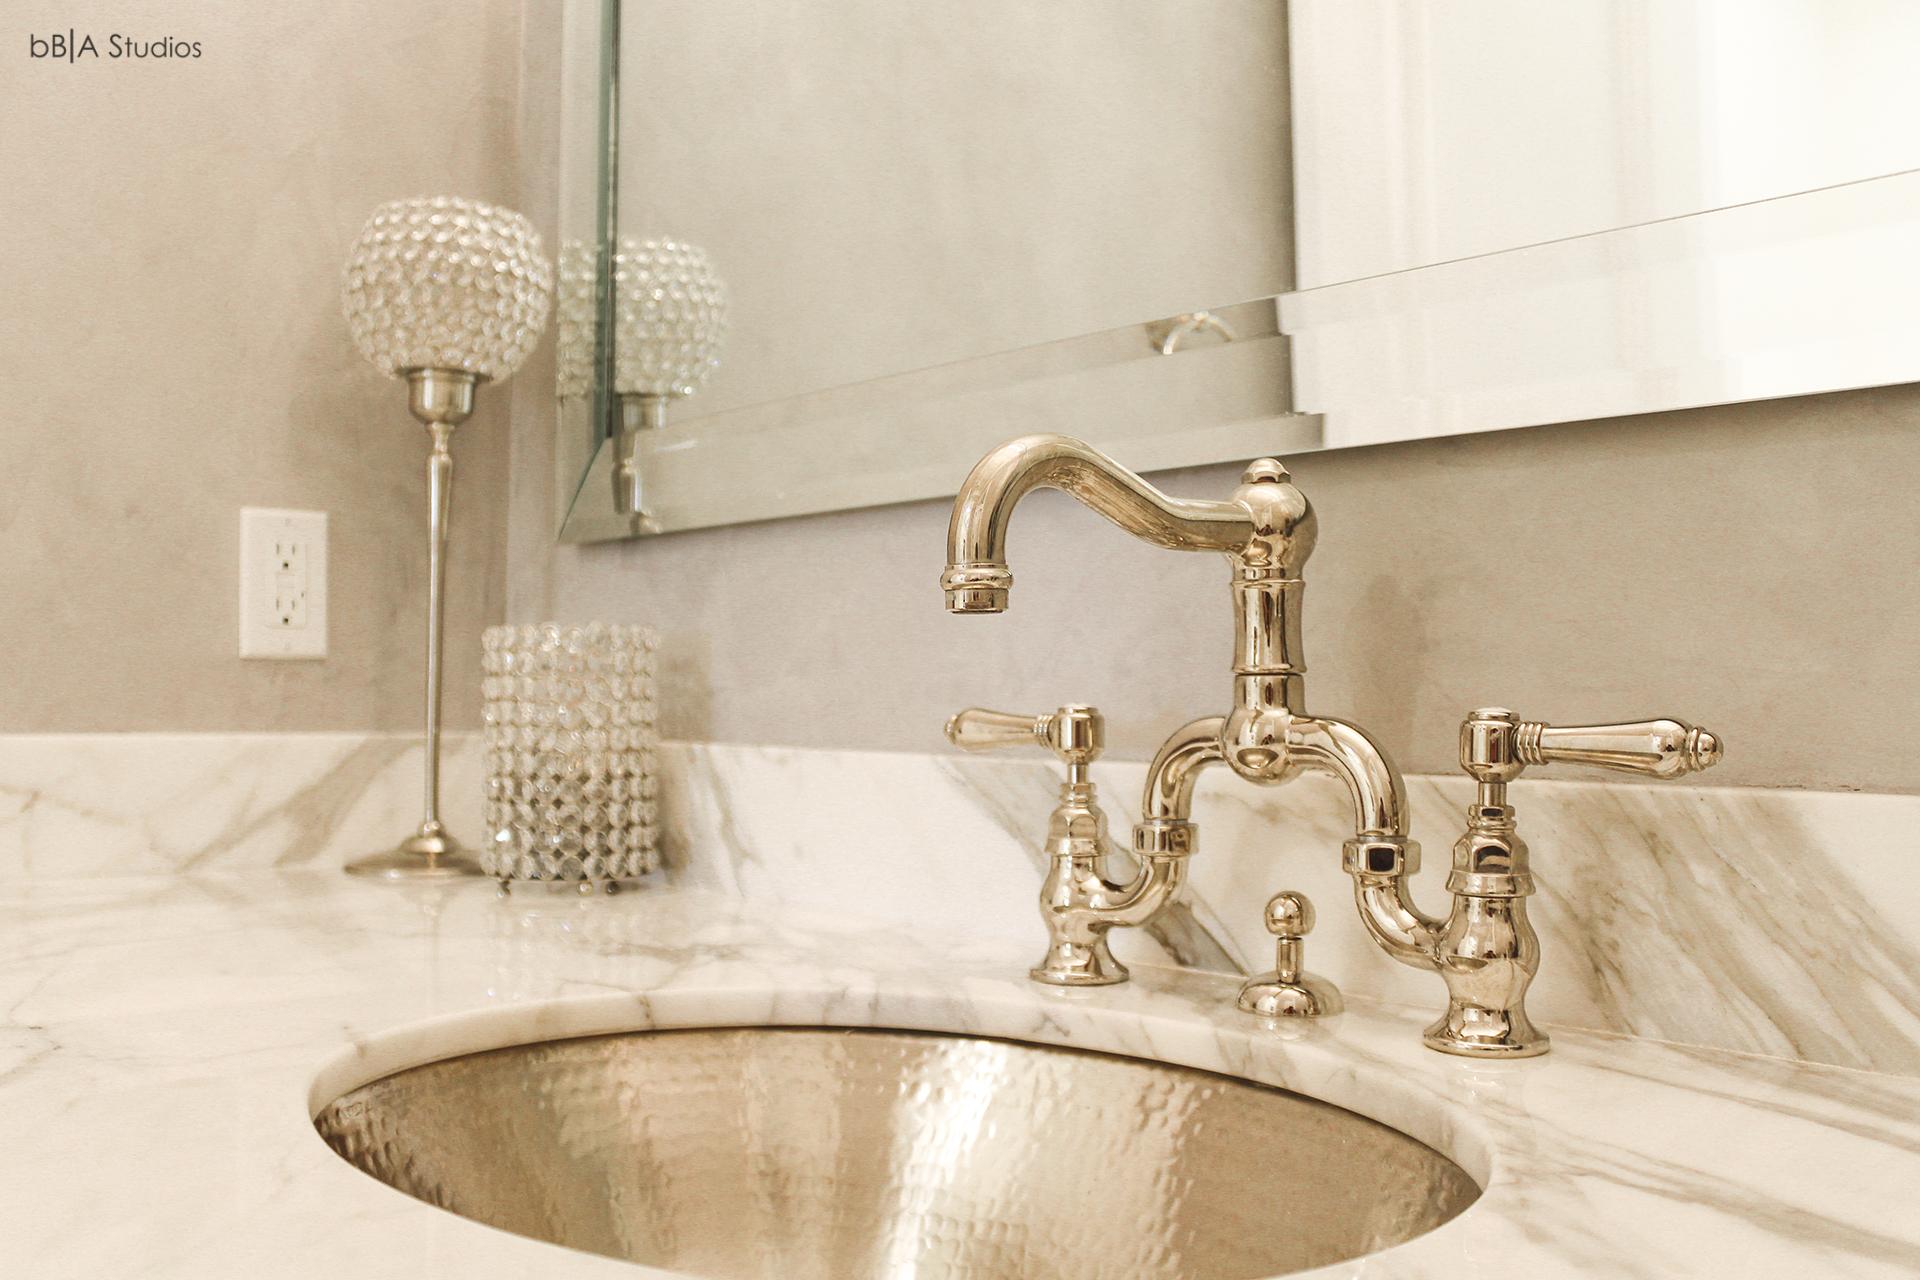 Bathroom style inspiration